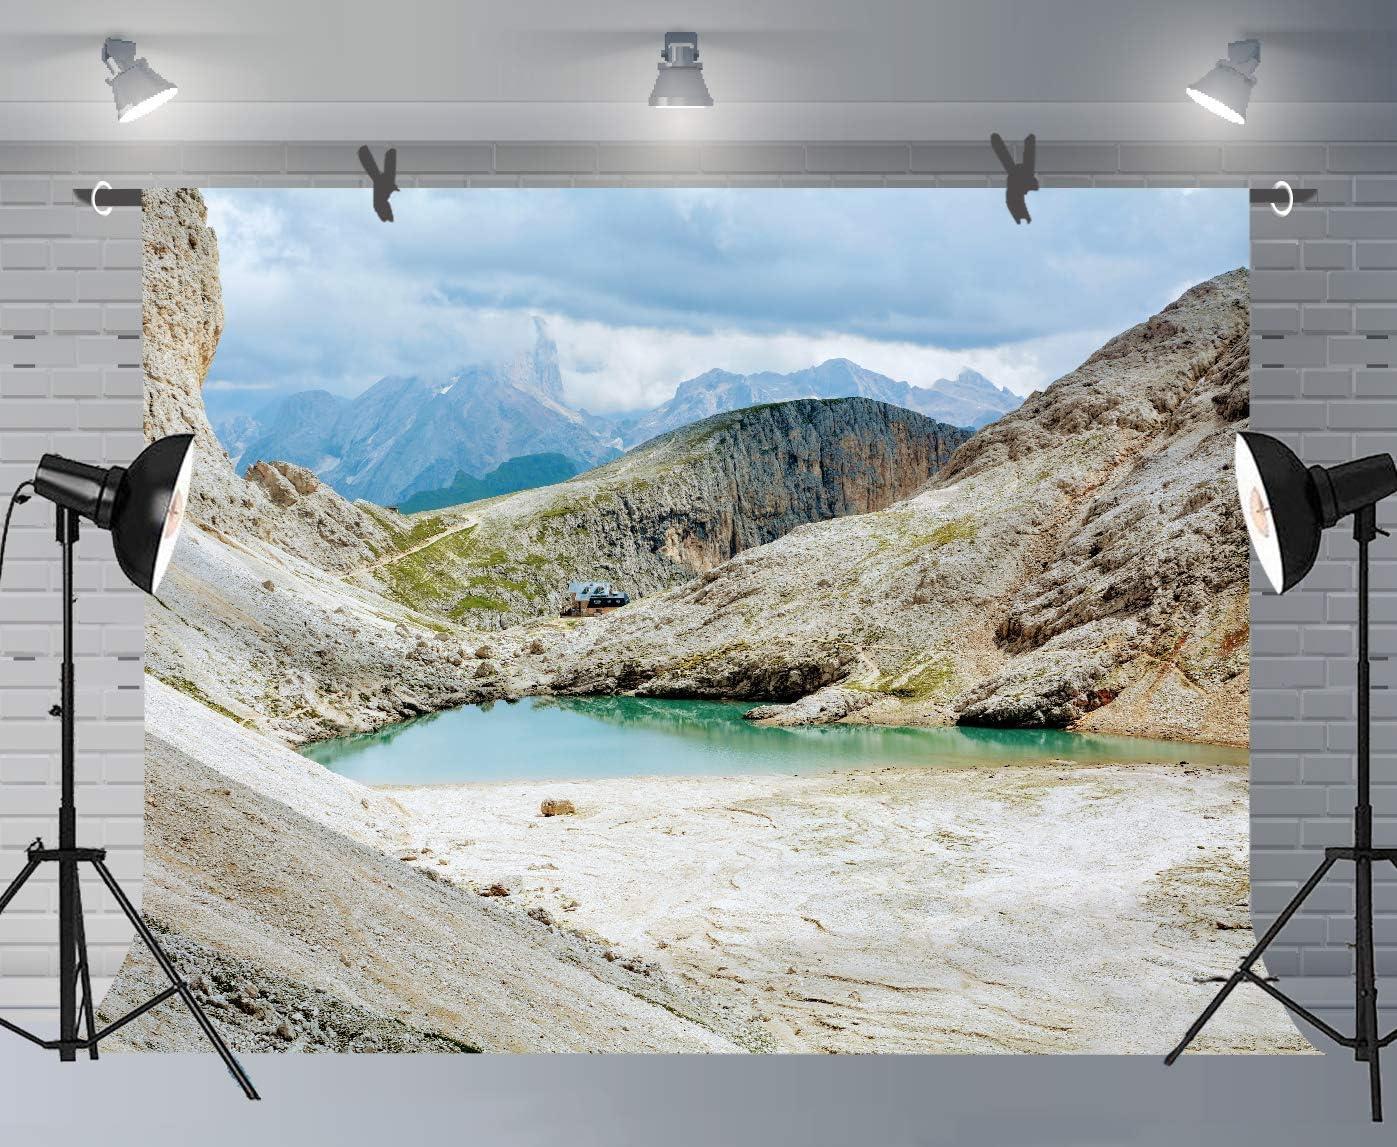 10x6.5ft Mountain and Lake Photography Backdrop Scenery Photo Props FUSK005